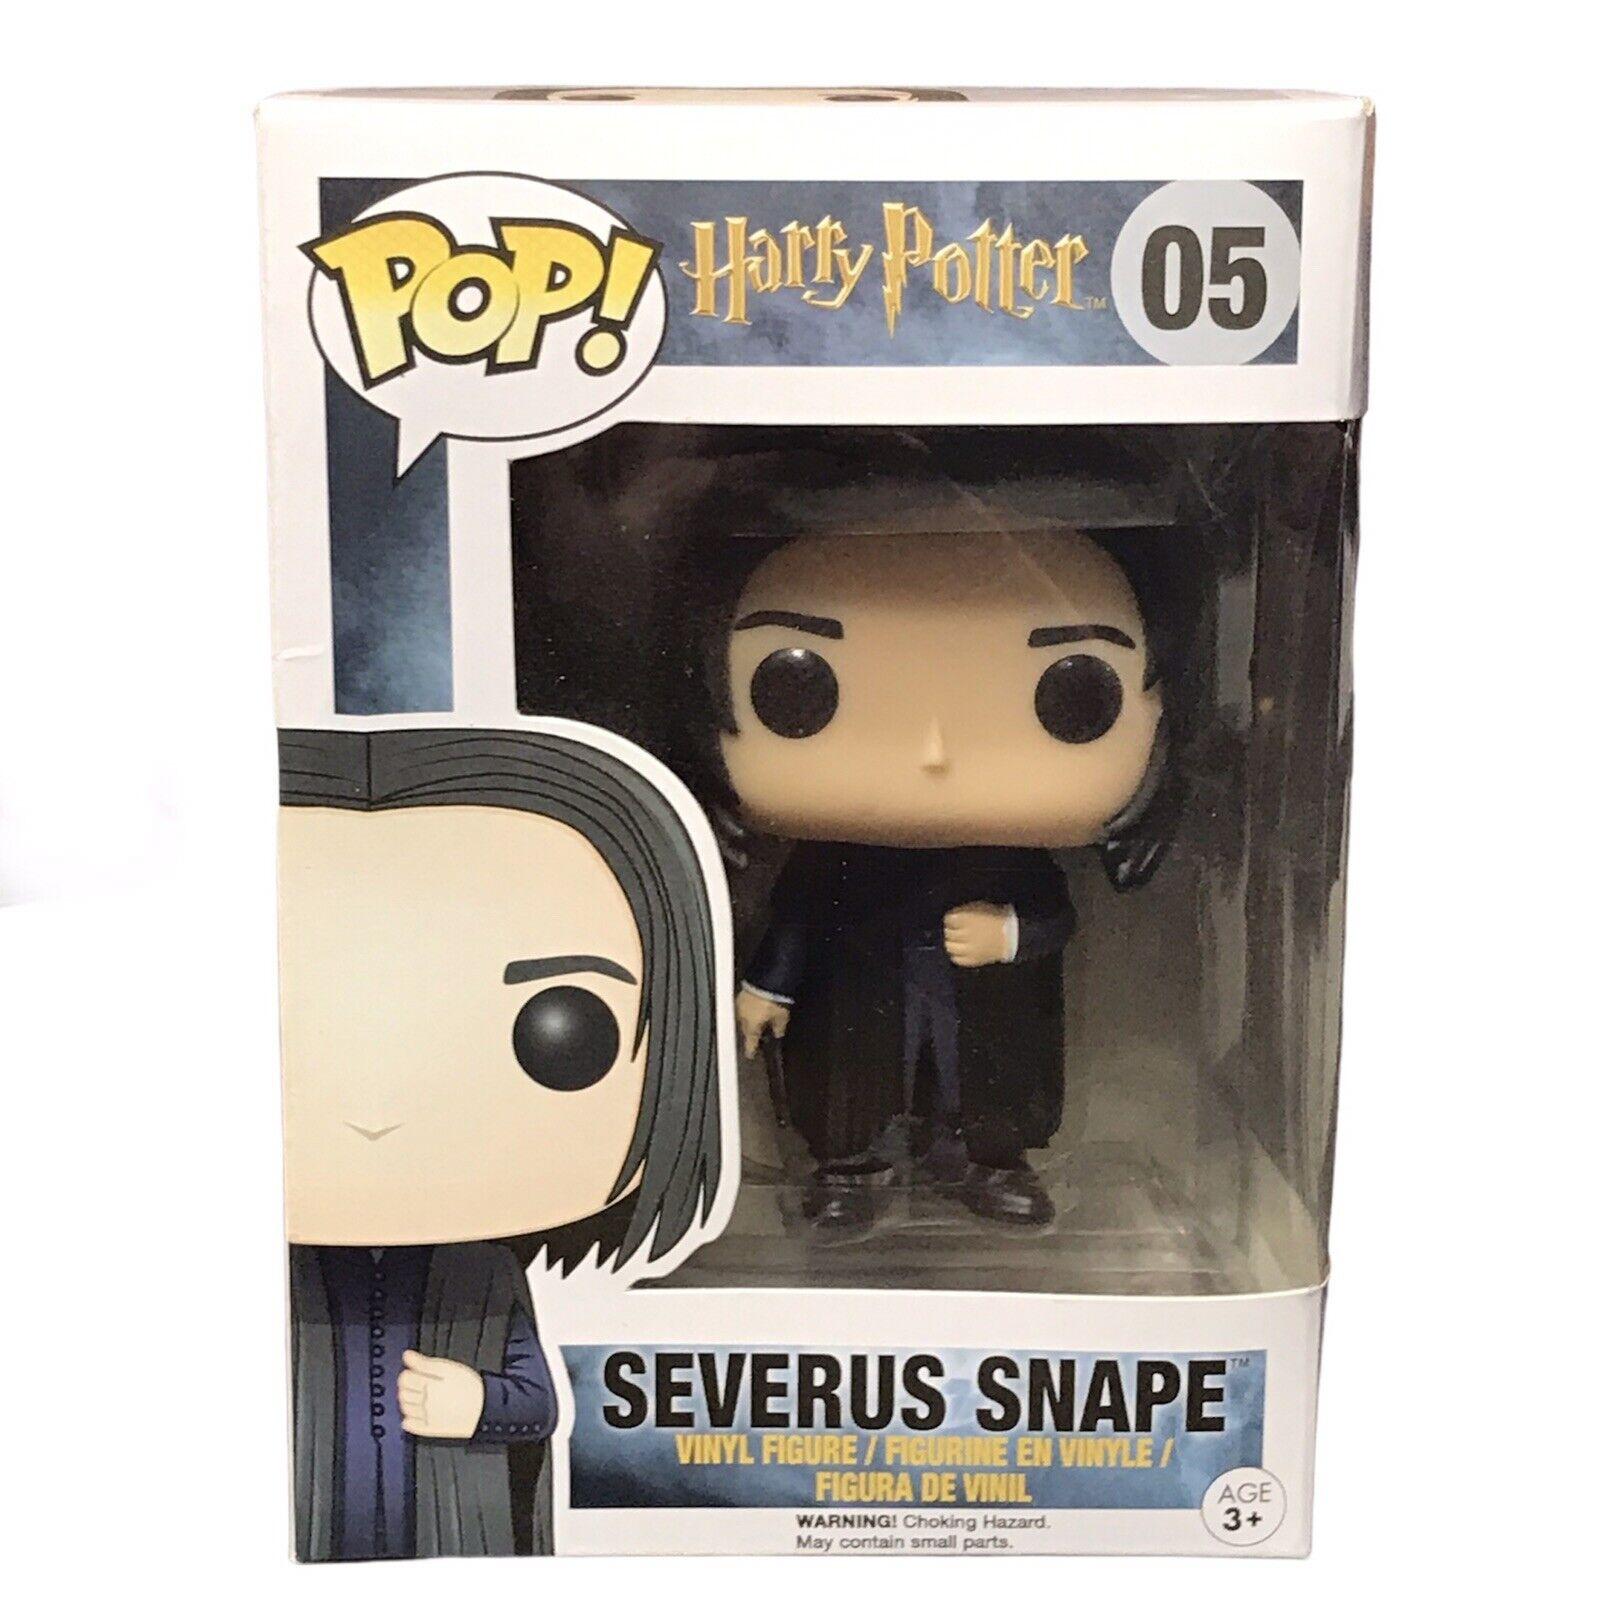 Funko Pop Harry Potter Professor Snape 05 NIB New Vinyl Figure Collectible